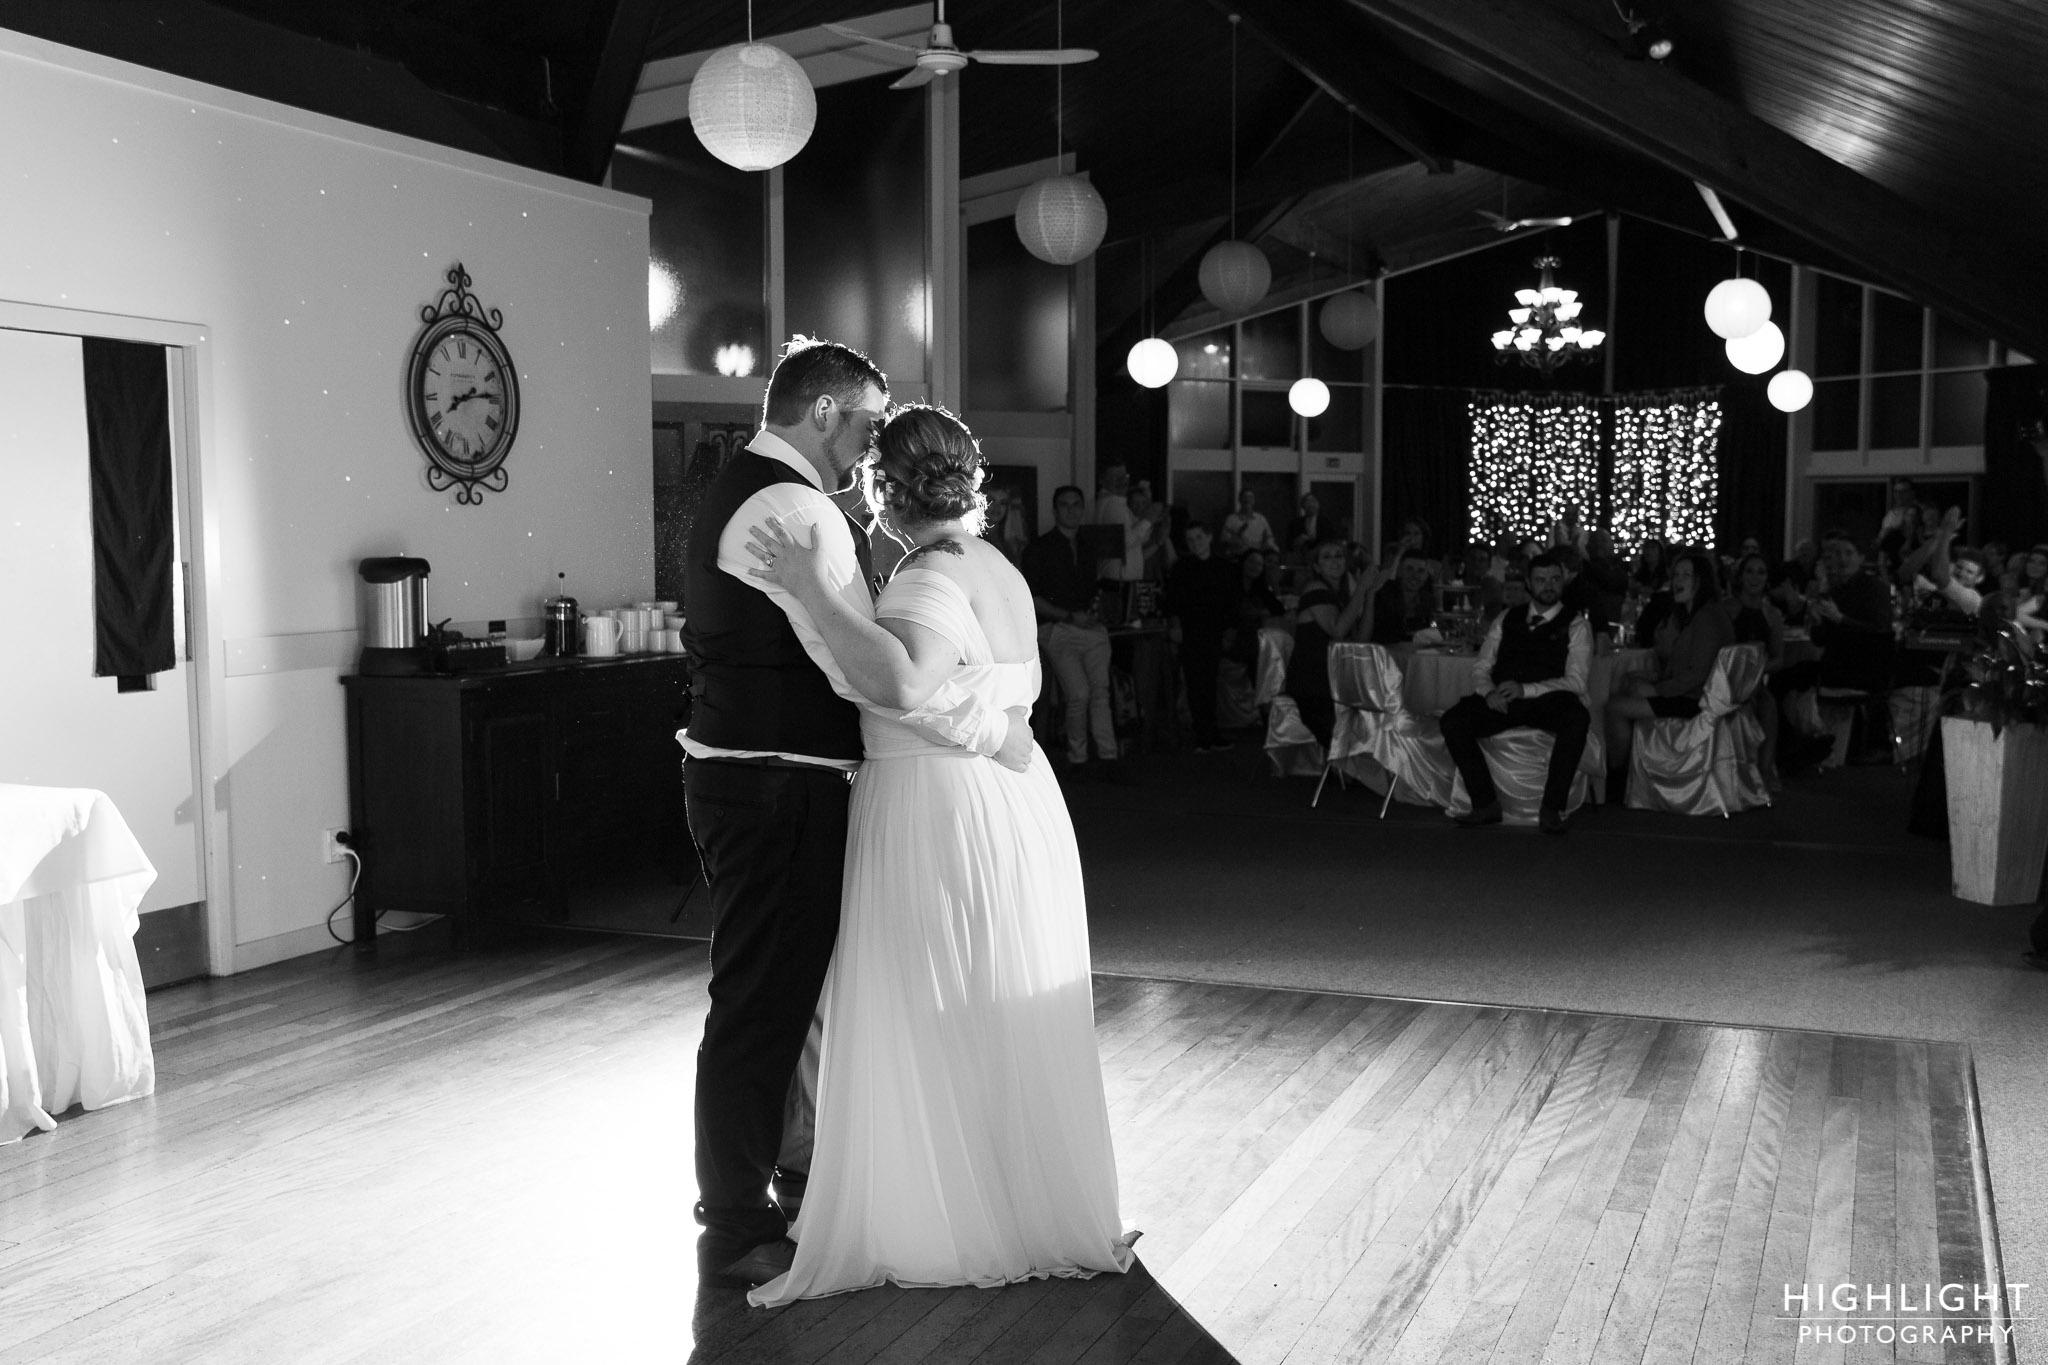 Highlight-wedding-photography-new-zealand-palmerston-north-129.jpg